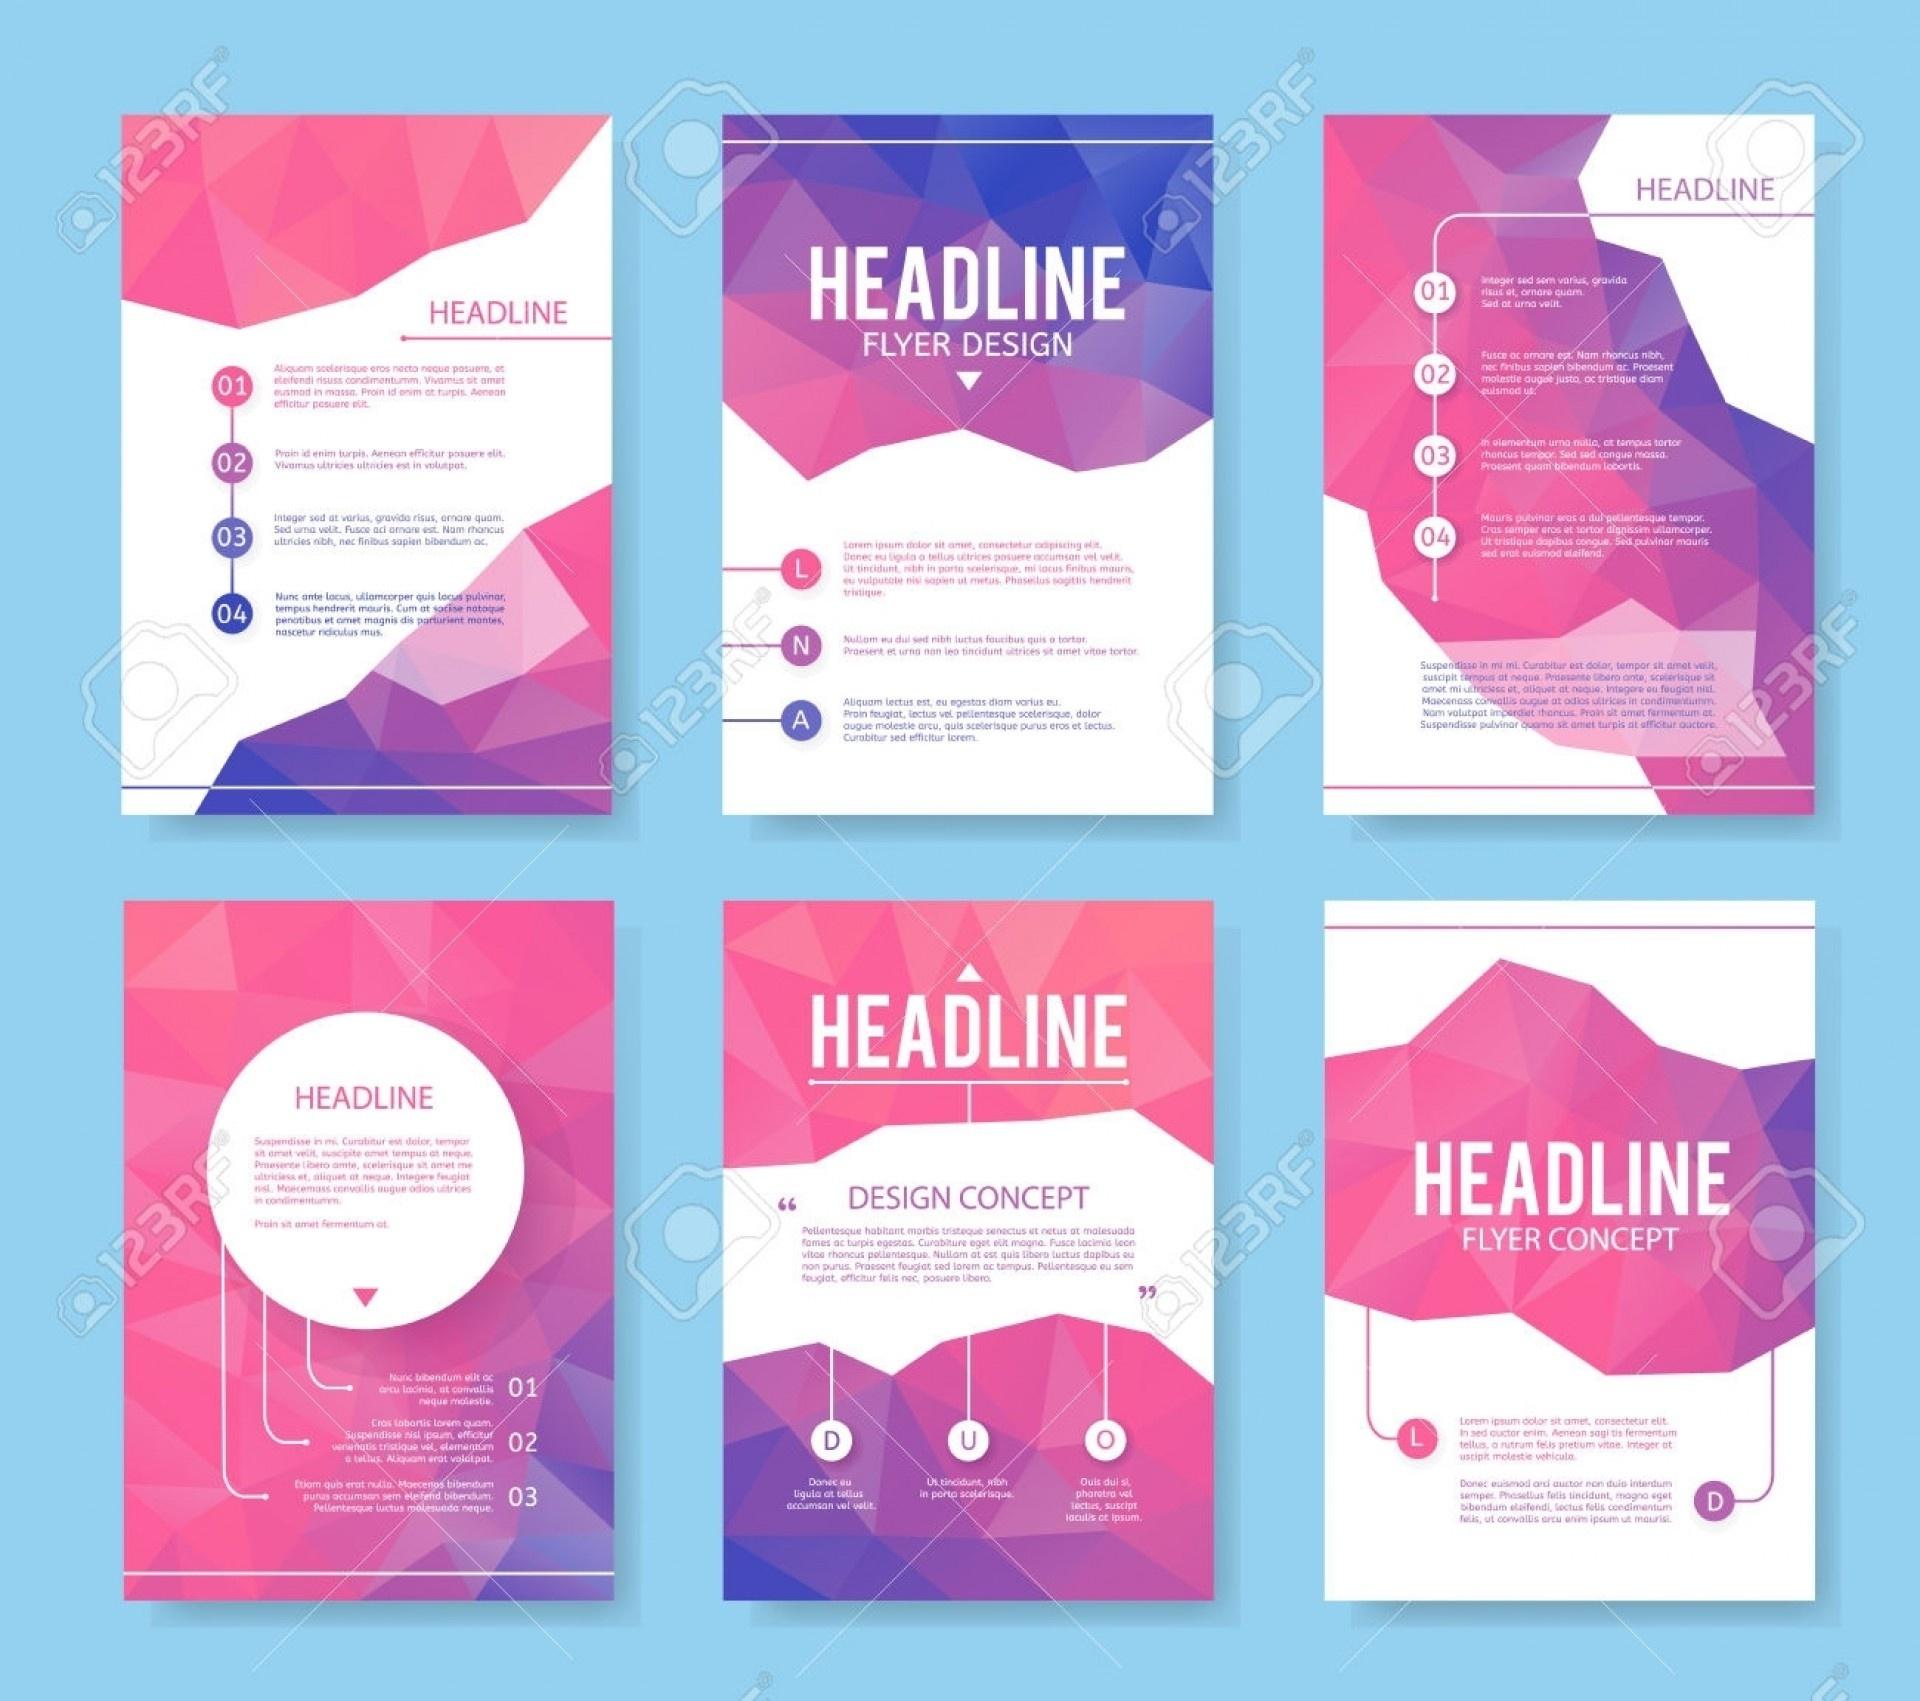 004 Template Ideas Free Printable Flyer Templates Blank Brochure - Free Printable Flyer Templates